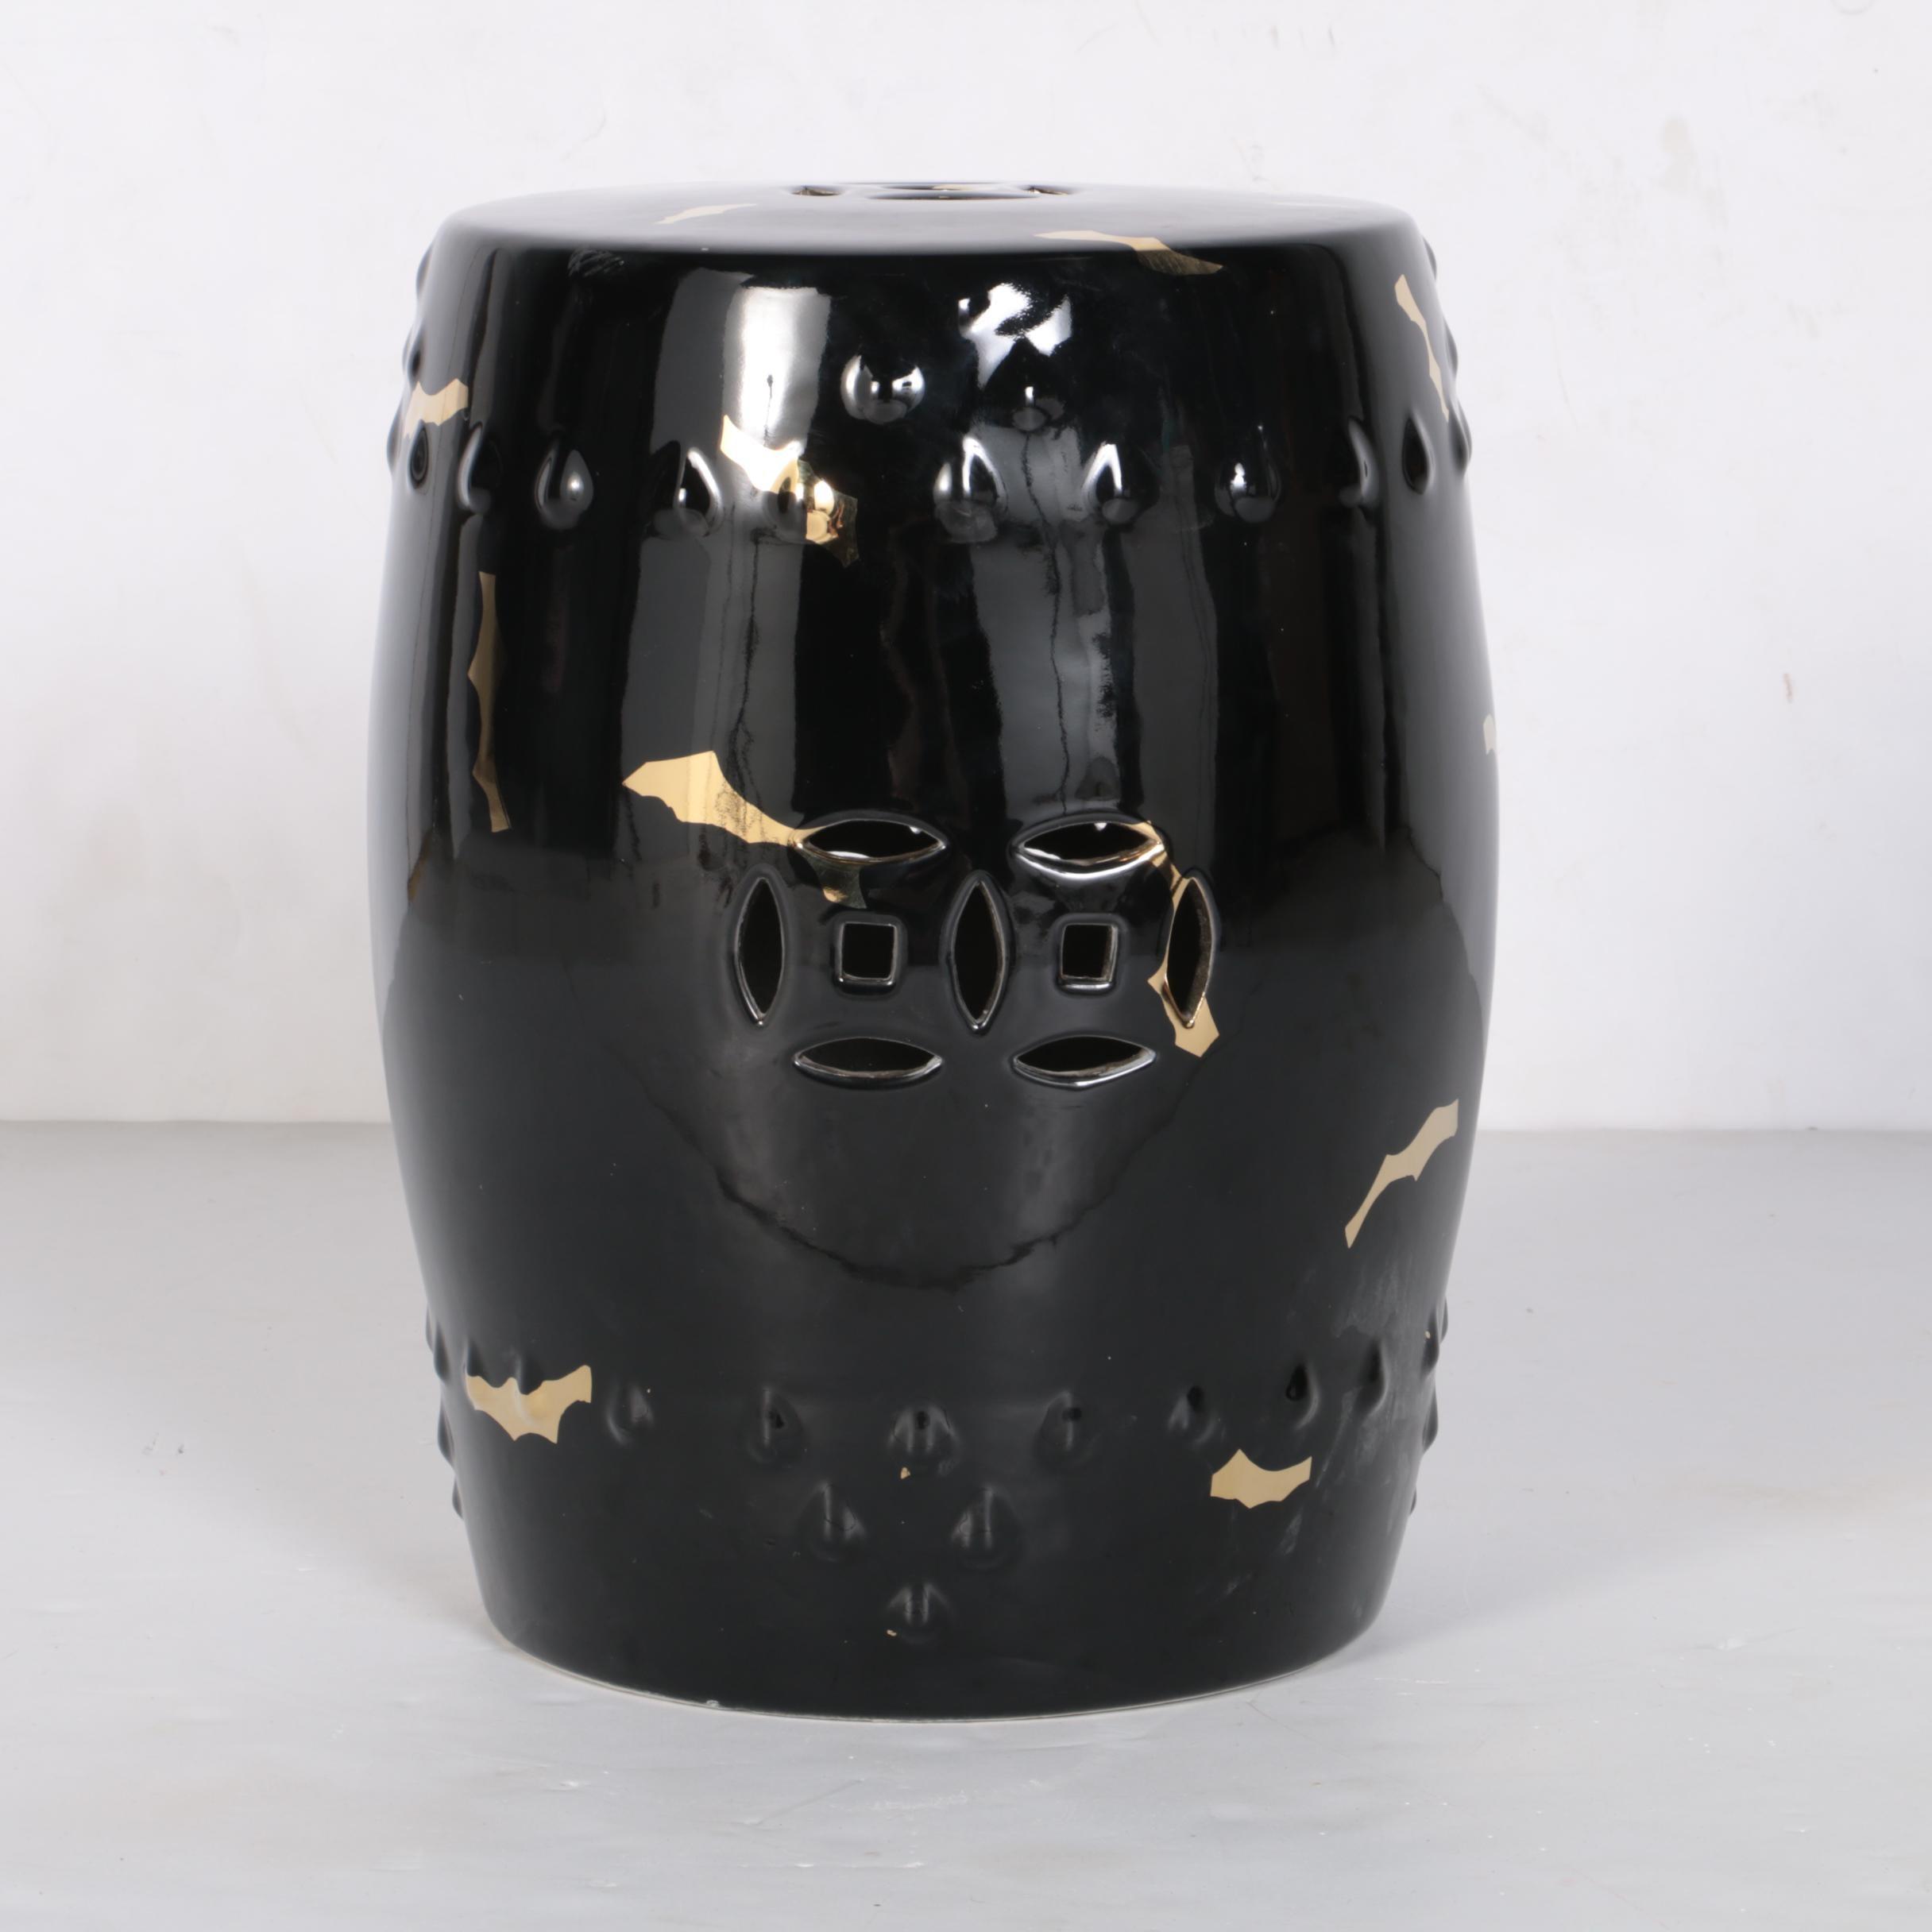 Chinese Black Painted Ceramic Garden Stool